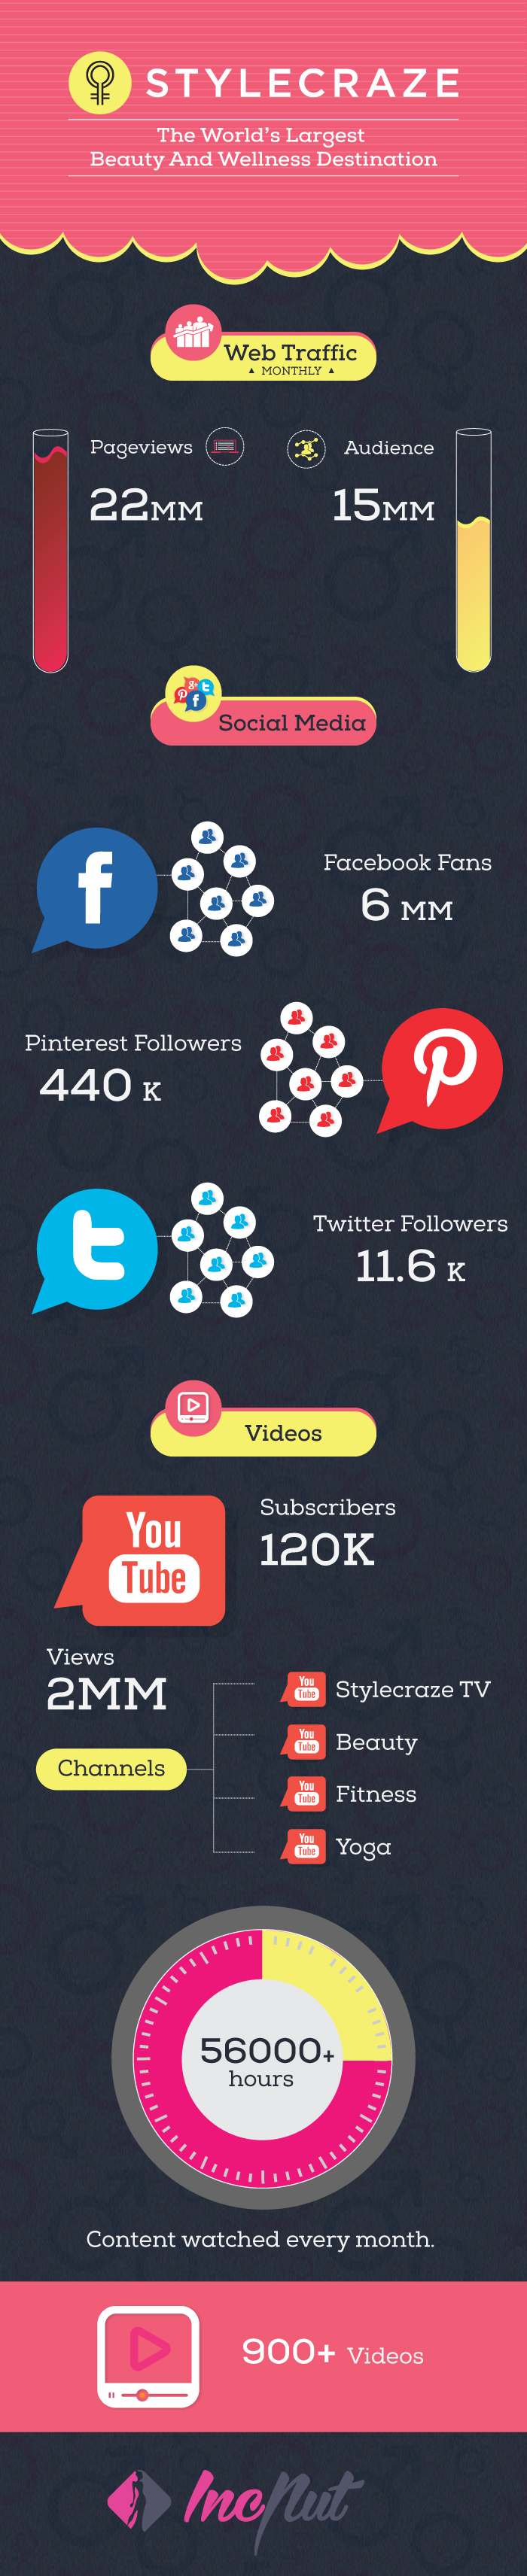 Stylecraze-Traffic-numbers-infographic